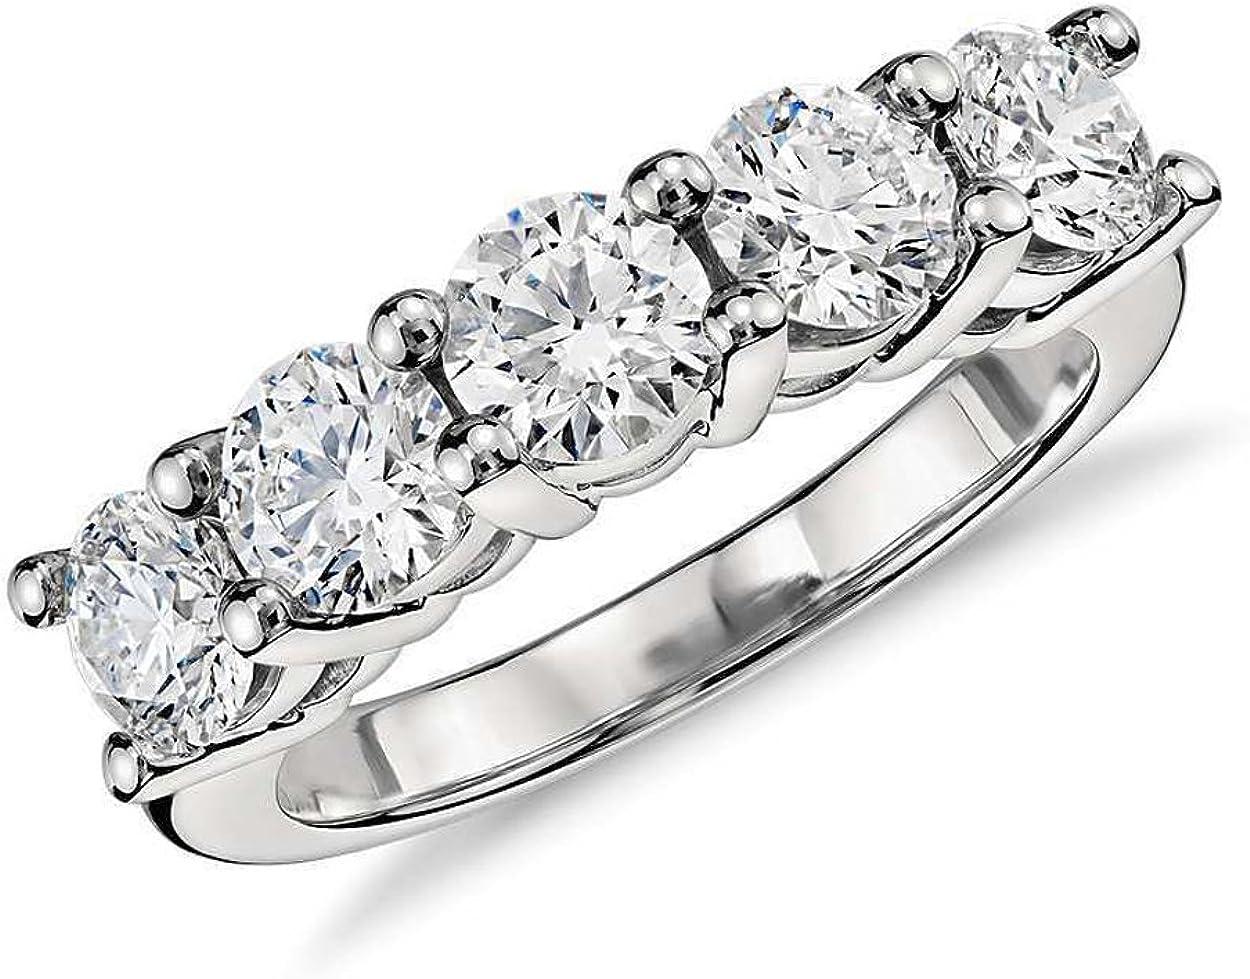 JewelMore 1ct Five Stone Diamond Band 14K White Gold